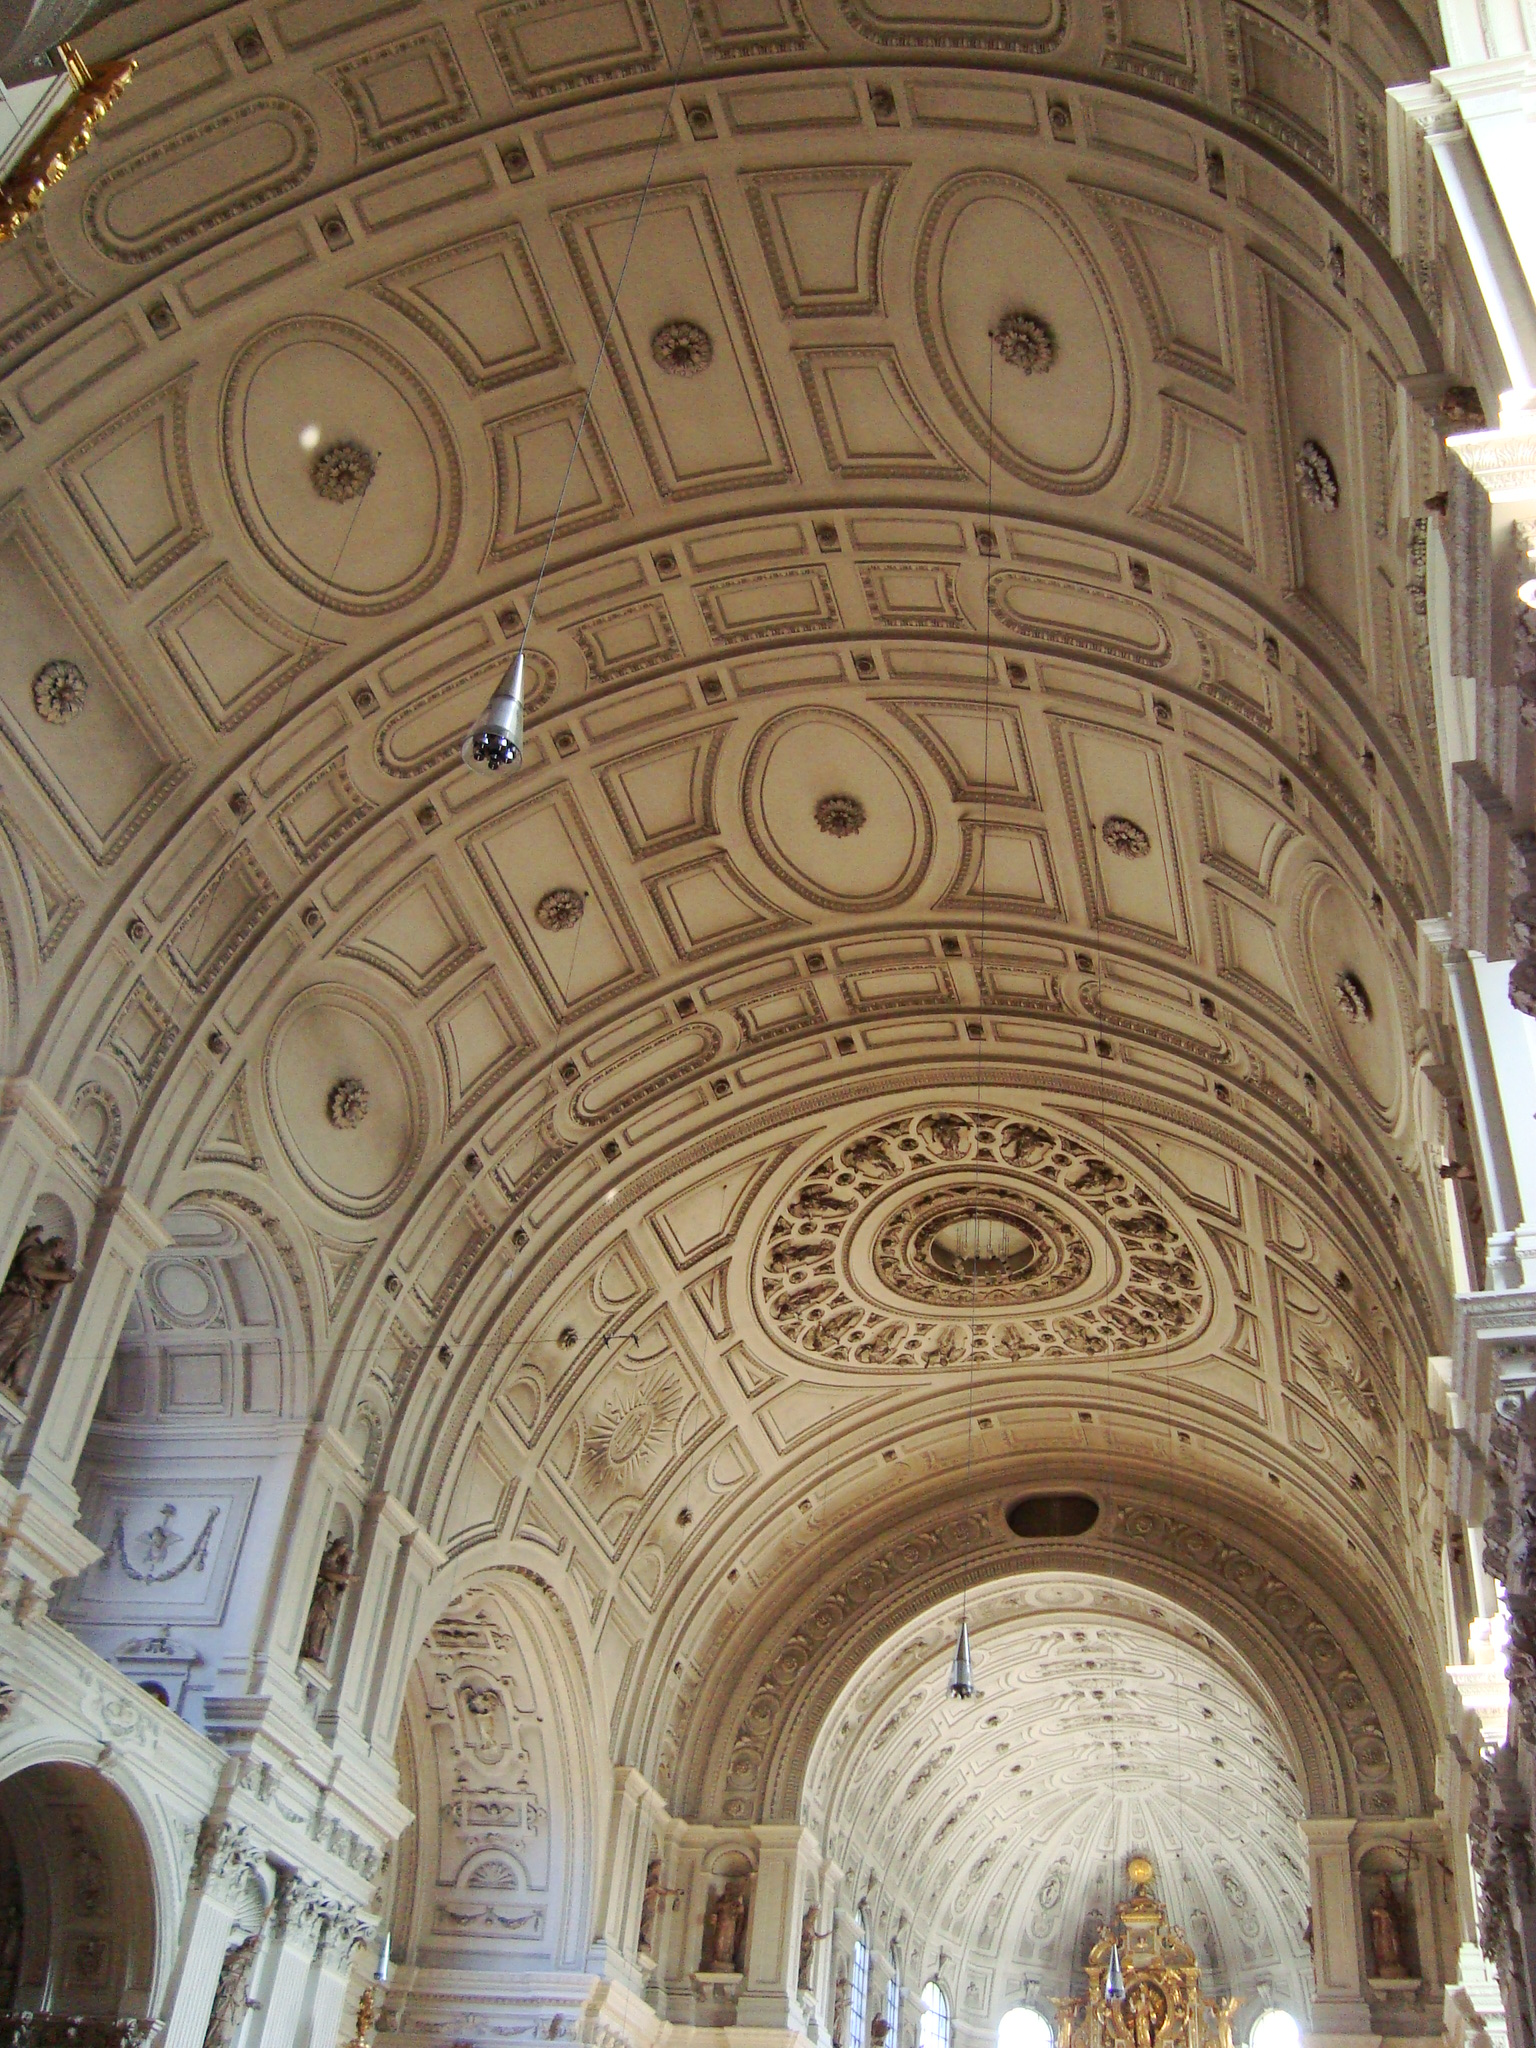 Source Nerdindeutschlandfileswordpress Report Roman Vault Architecture